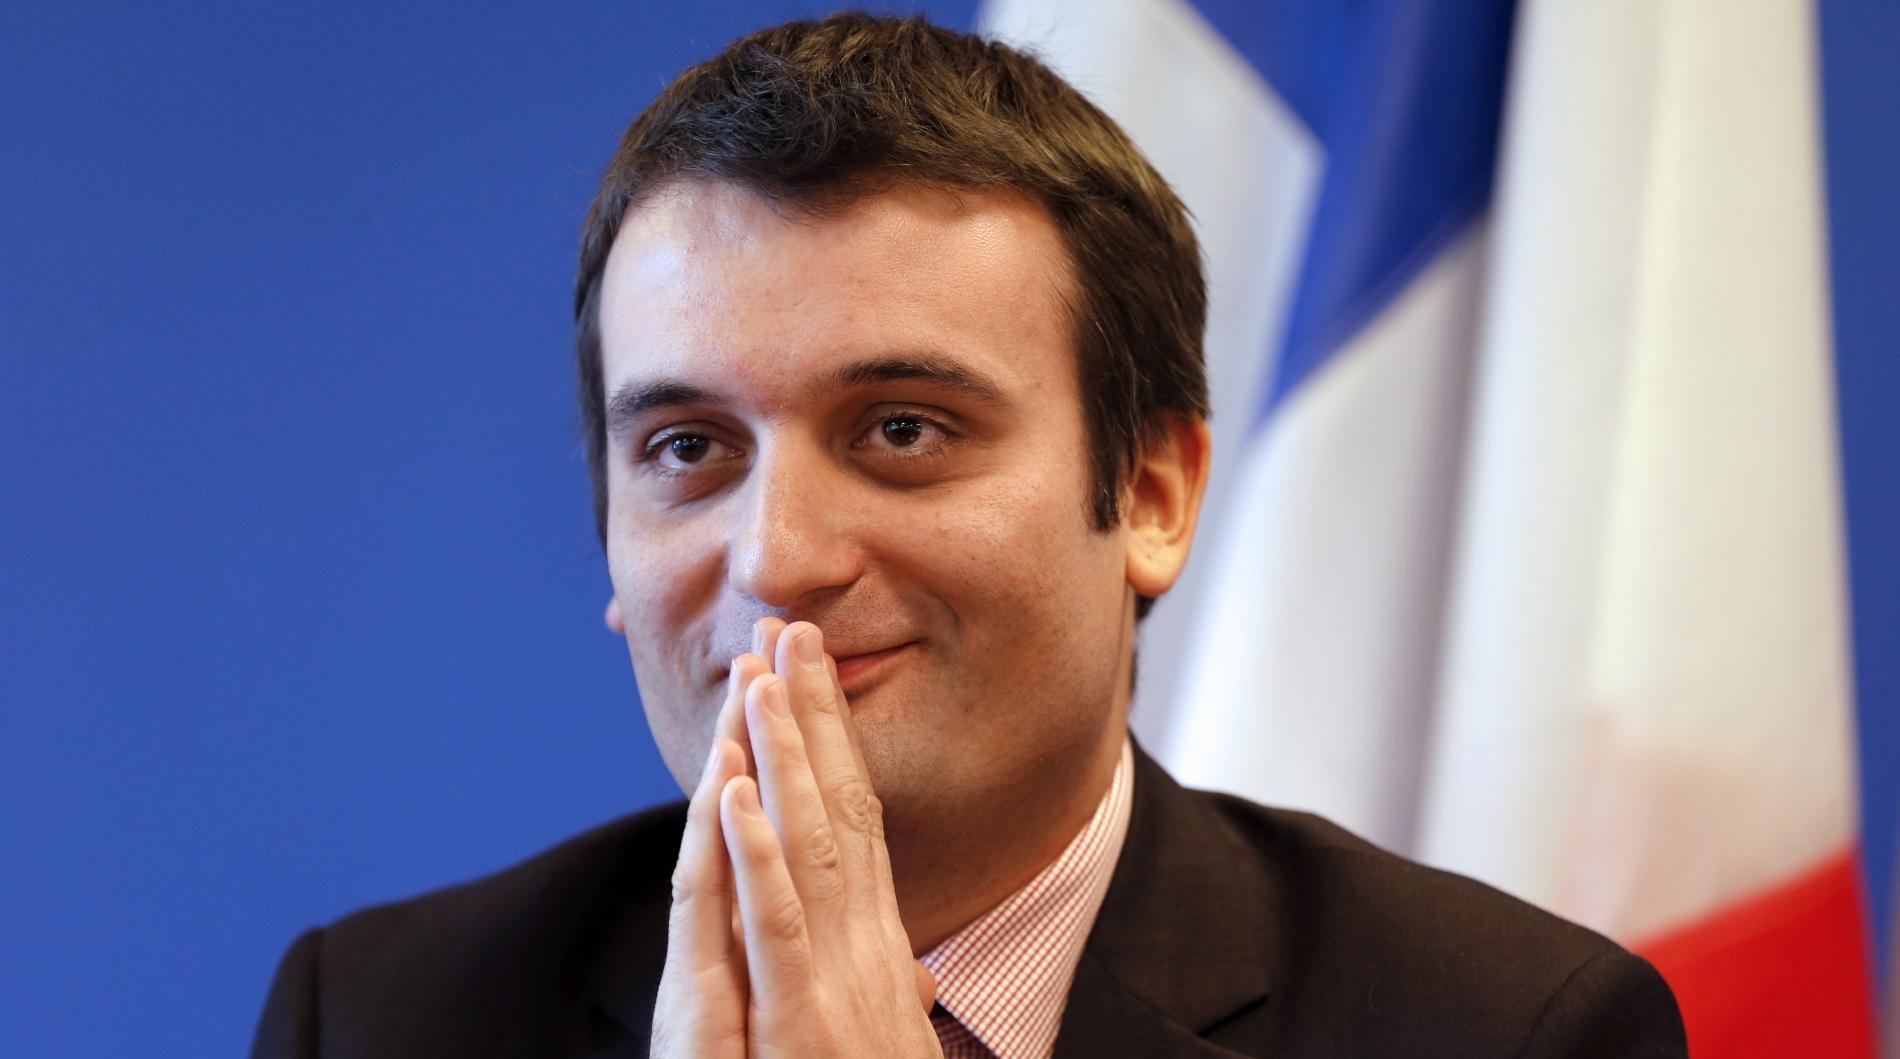 Florian Philippot @France TV